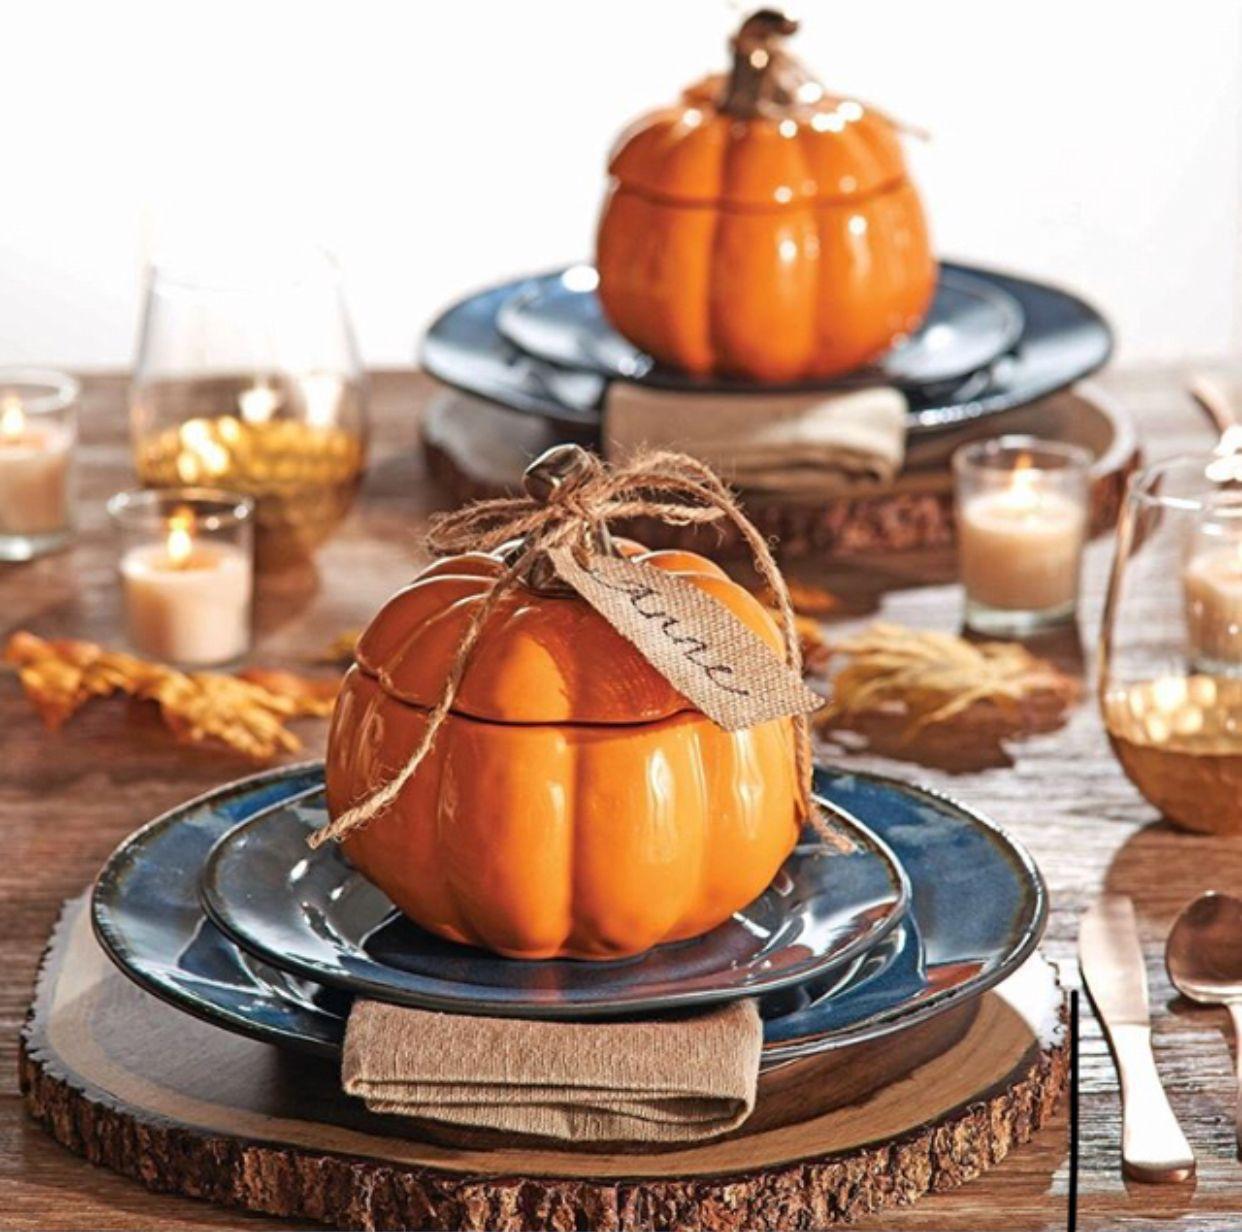 159c6c6e4d2d2a6f1215272984671ca1 - Better Homes And Gardens Pumpkin Bowls